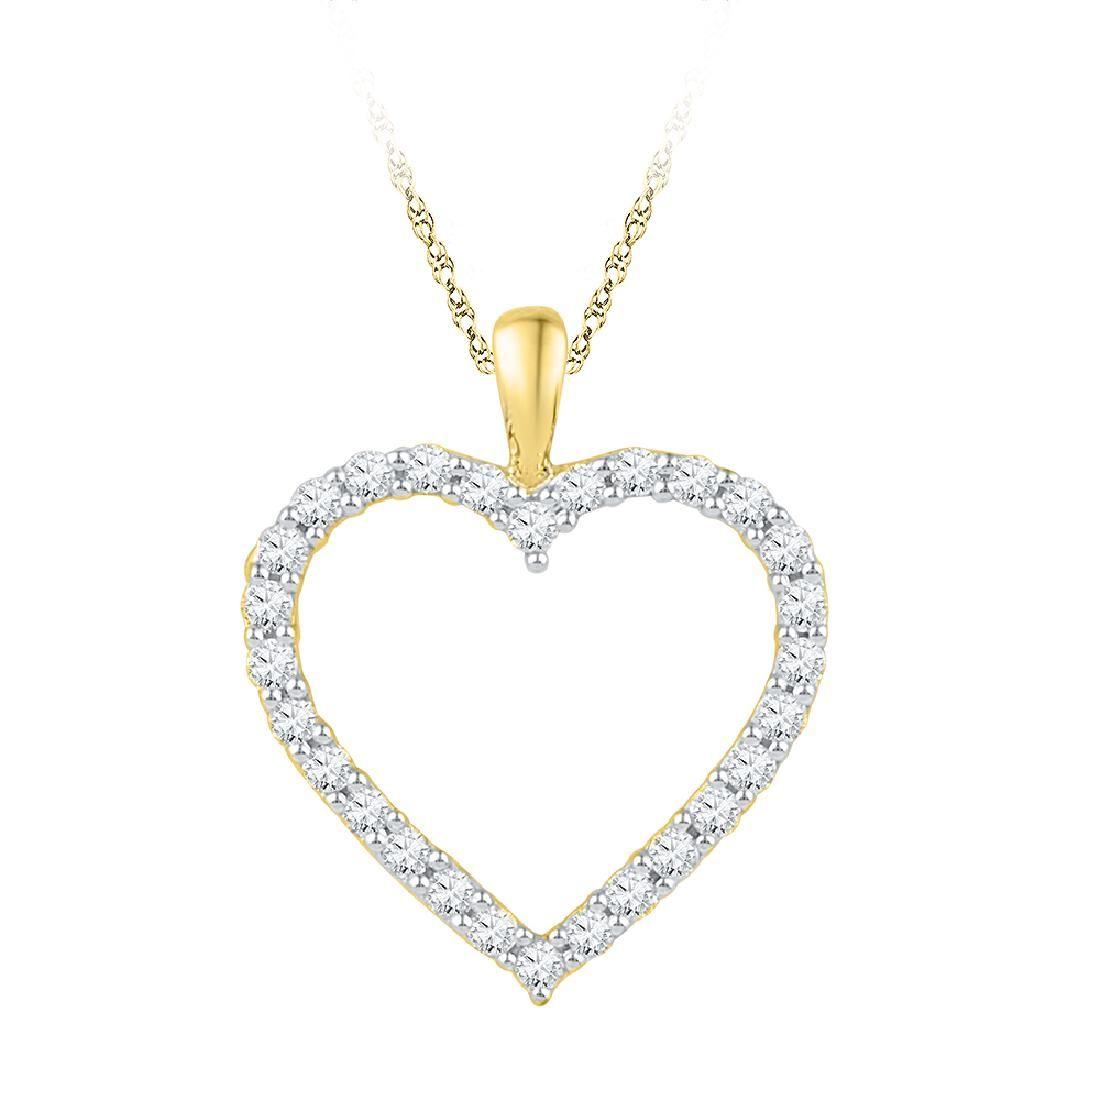 025 CTW Diamond Heart Outline Pendant 10KT Yellow Gold